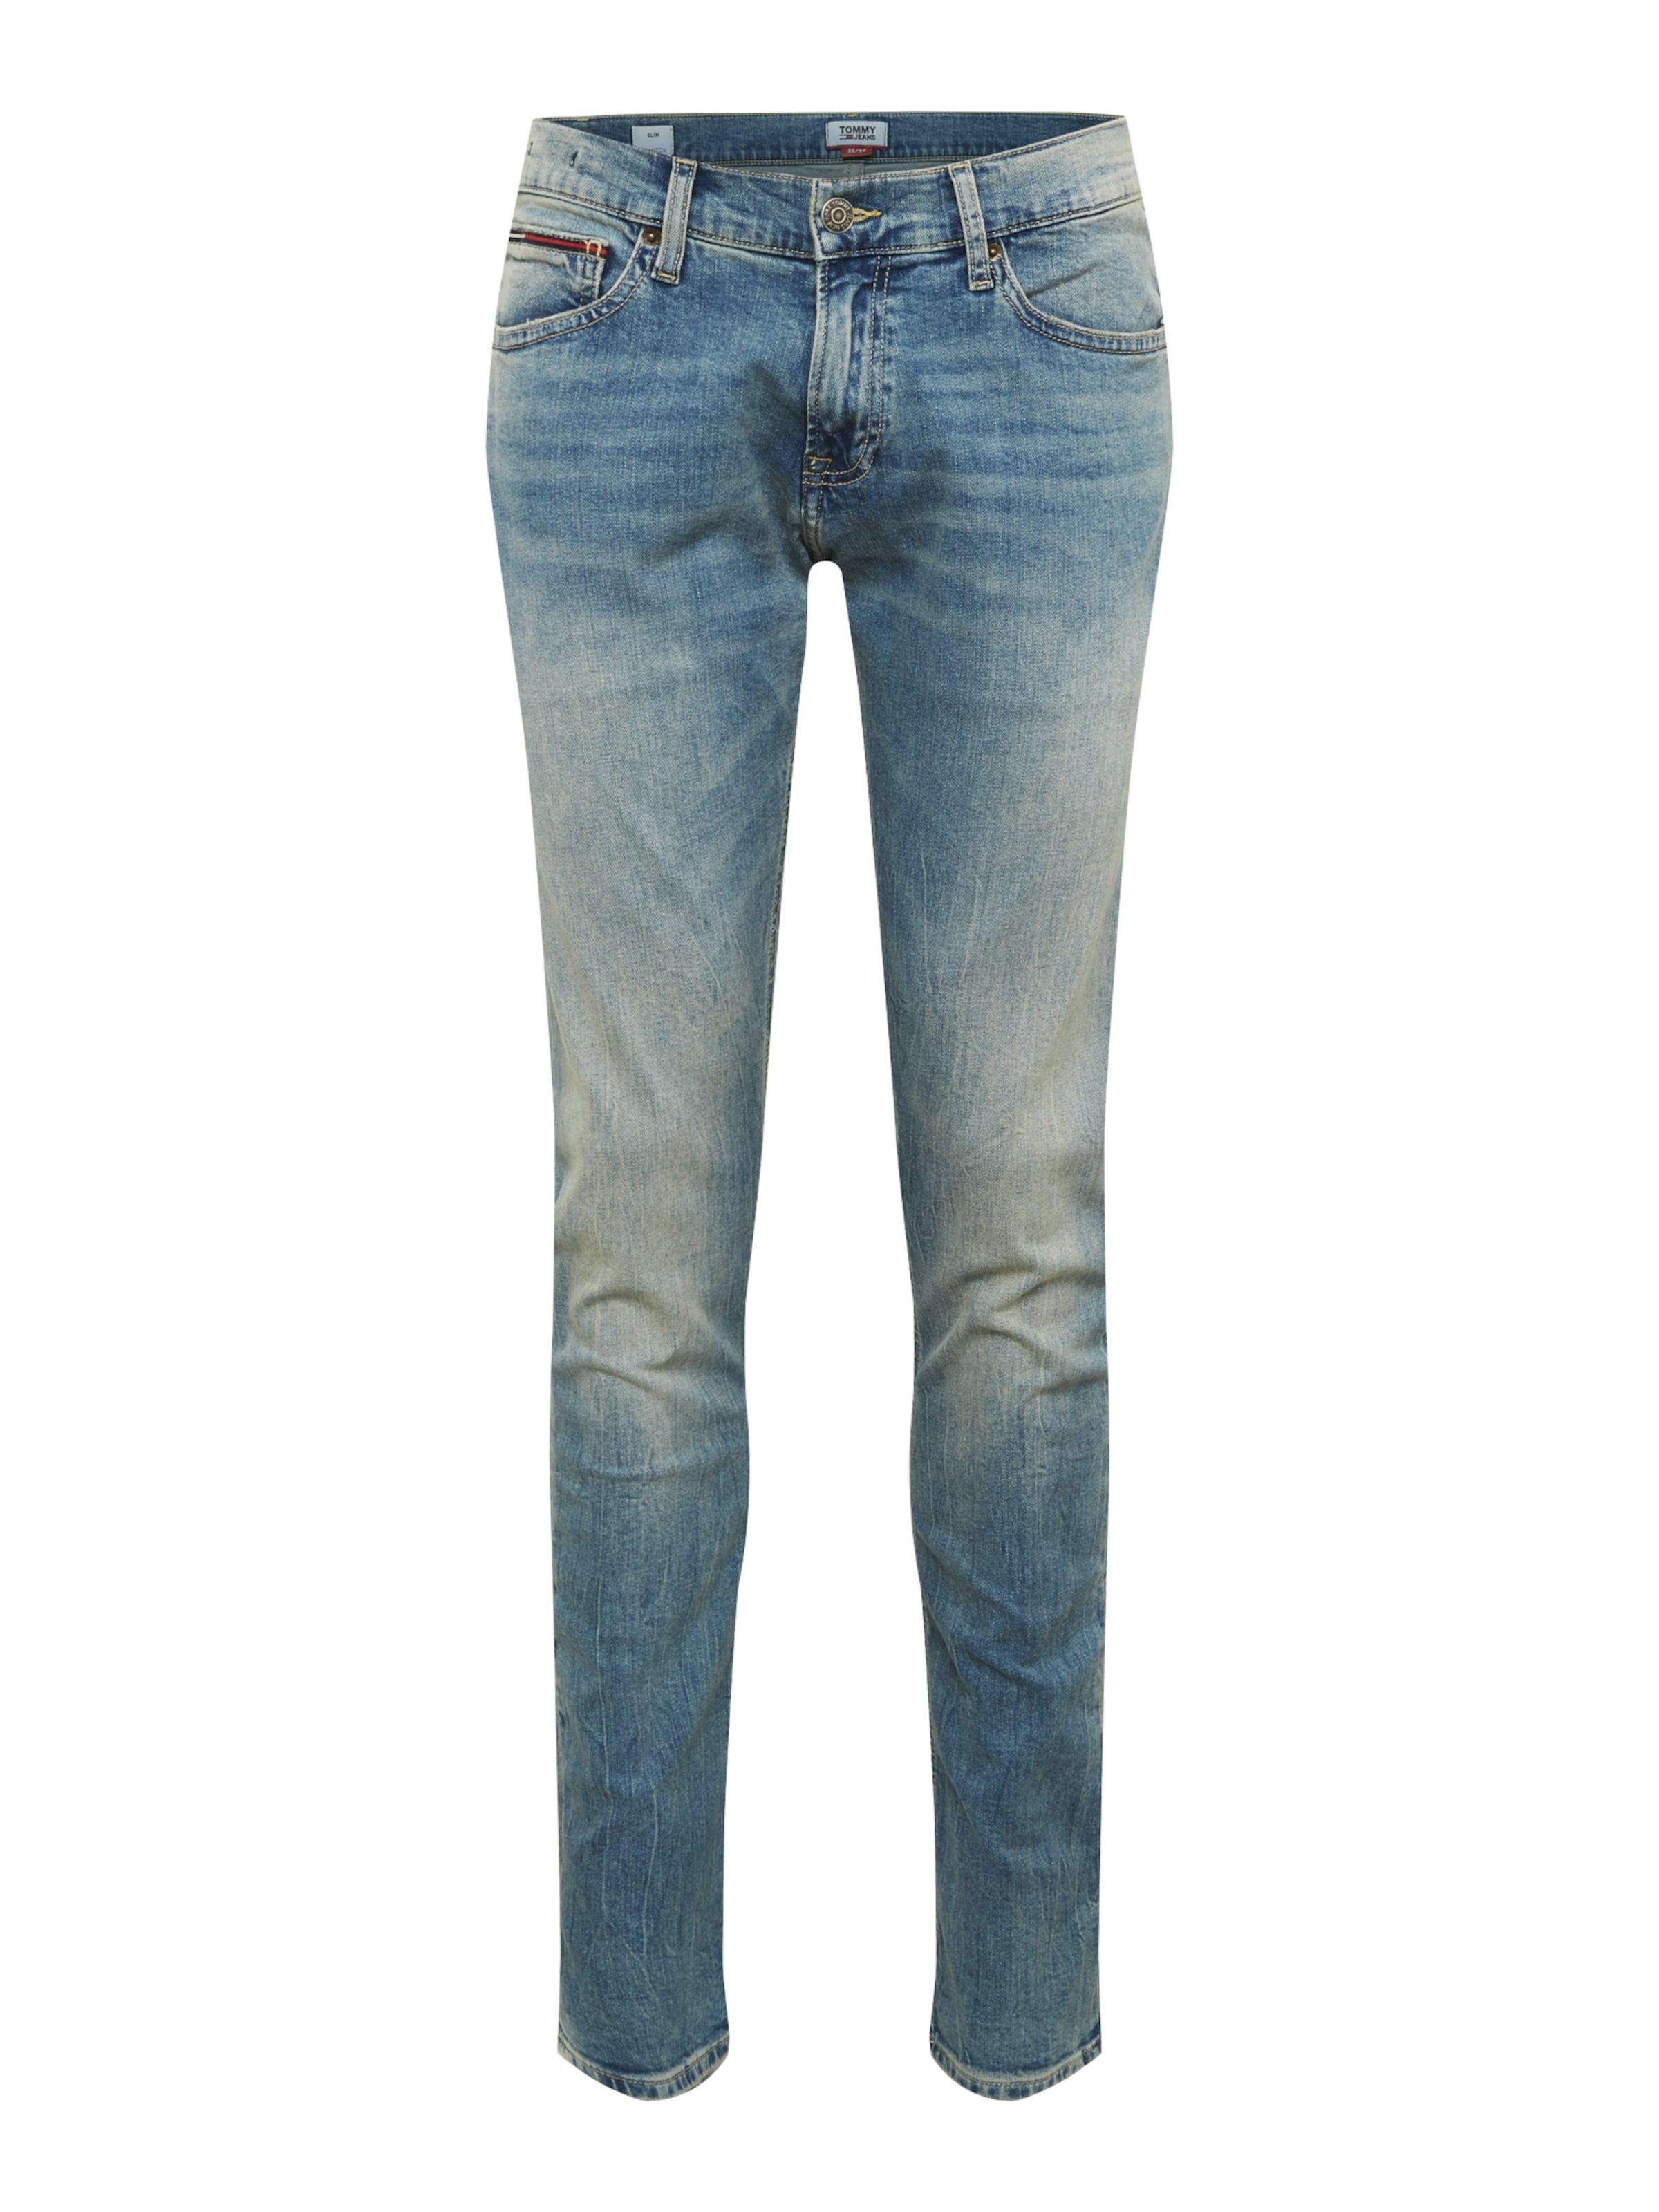 Tommy Jeans Scanton Blue Fltnbc' Denim 'slim In BrdexCo